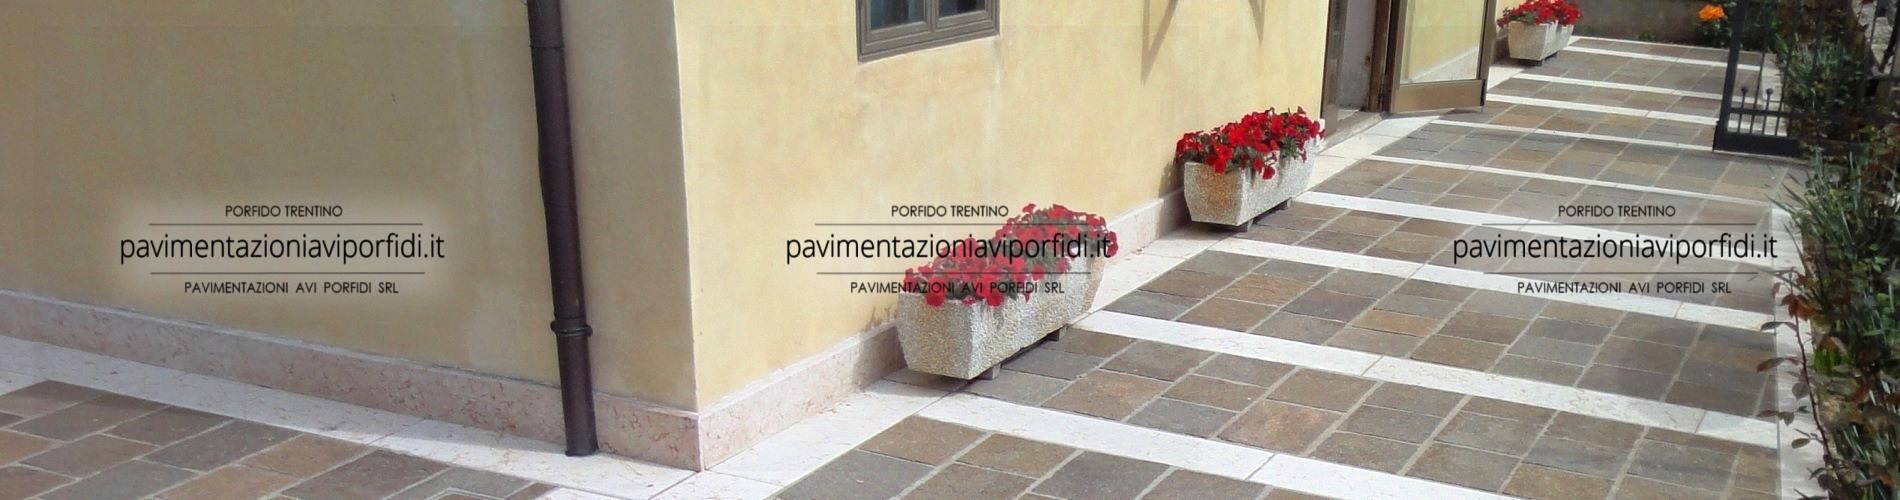 Best Pavimenti Per Terrazze Esterne Gallery - House Design Ideas ...